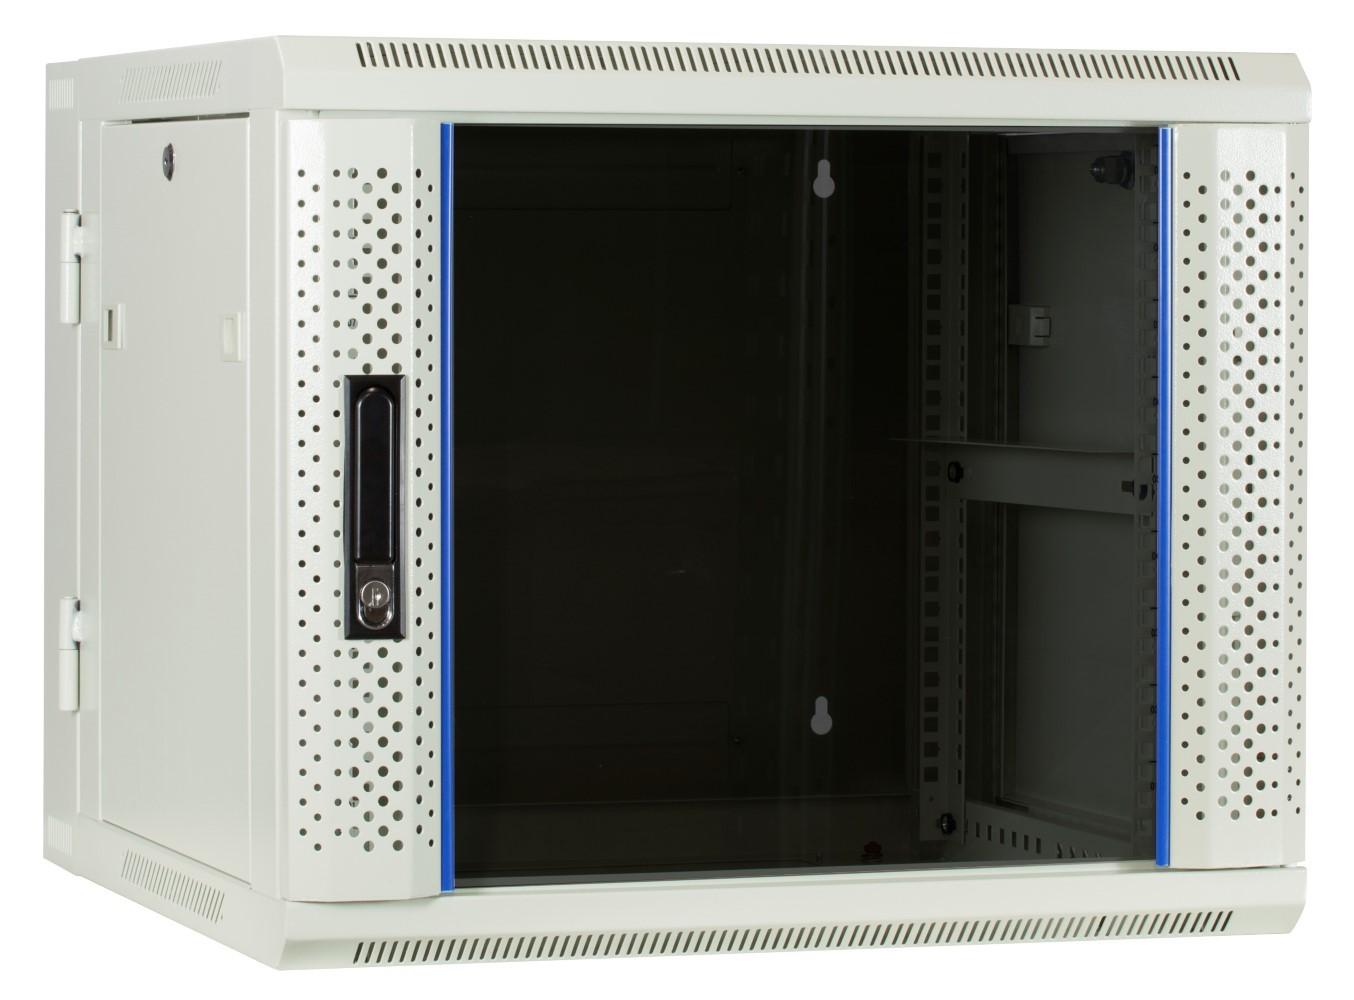 Afbeelding van 9U witte wandkast - kantelbaar met glazen deur 600x600x500mm